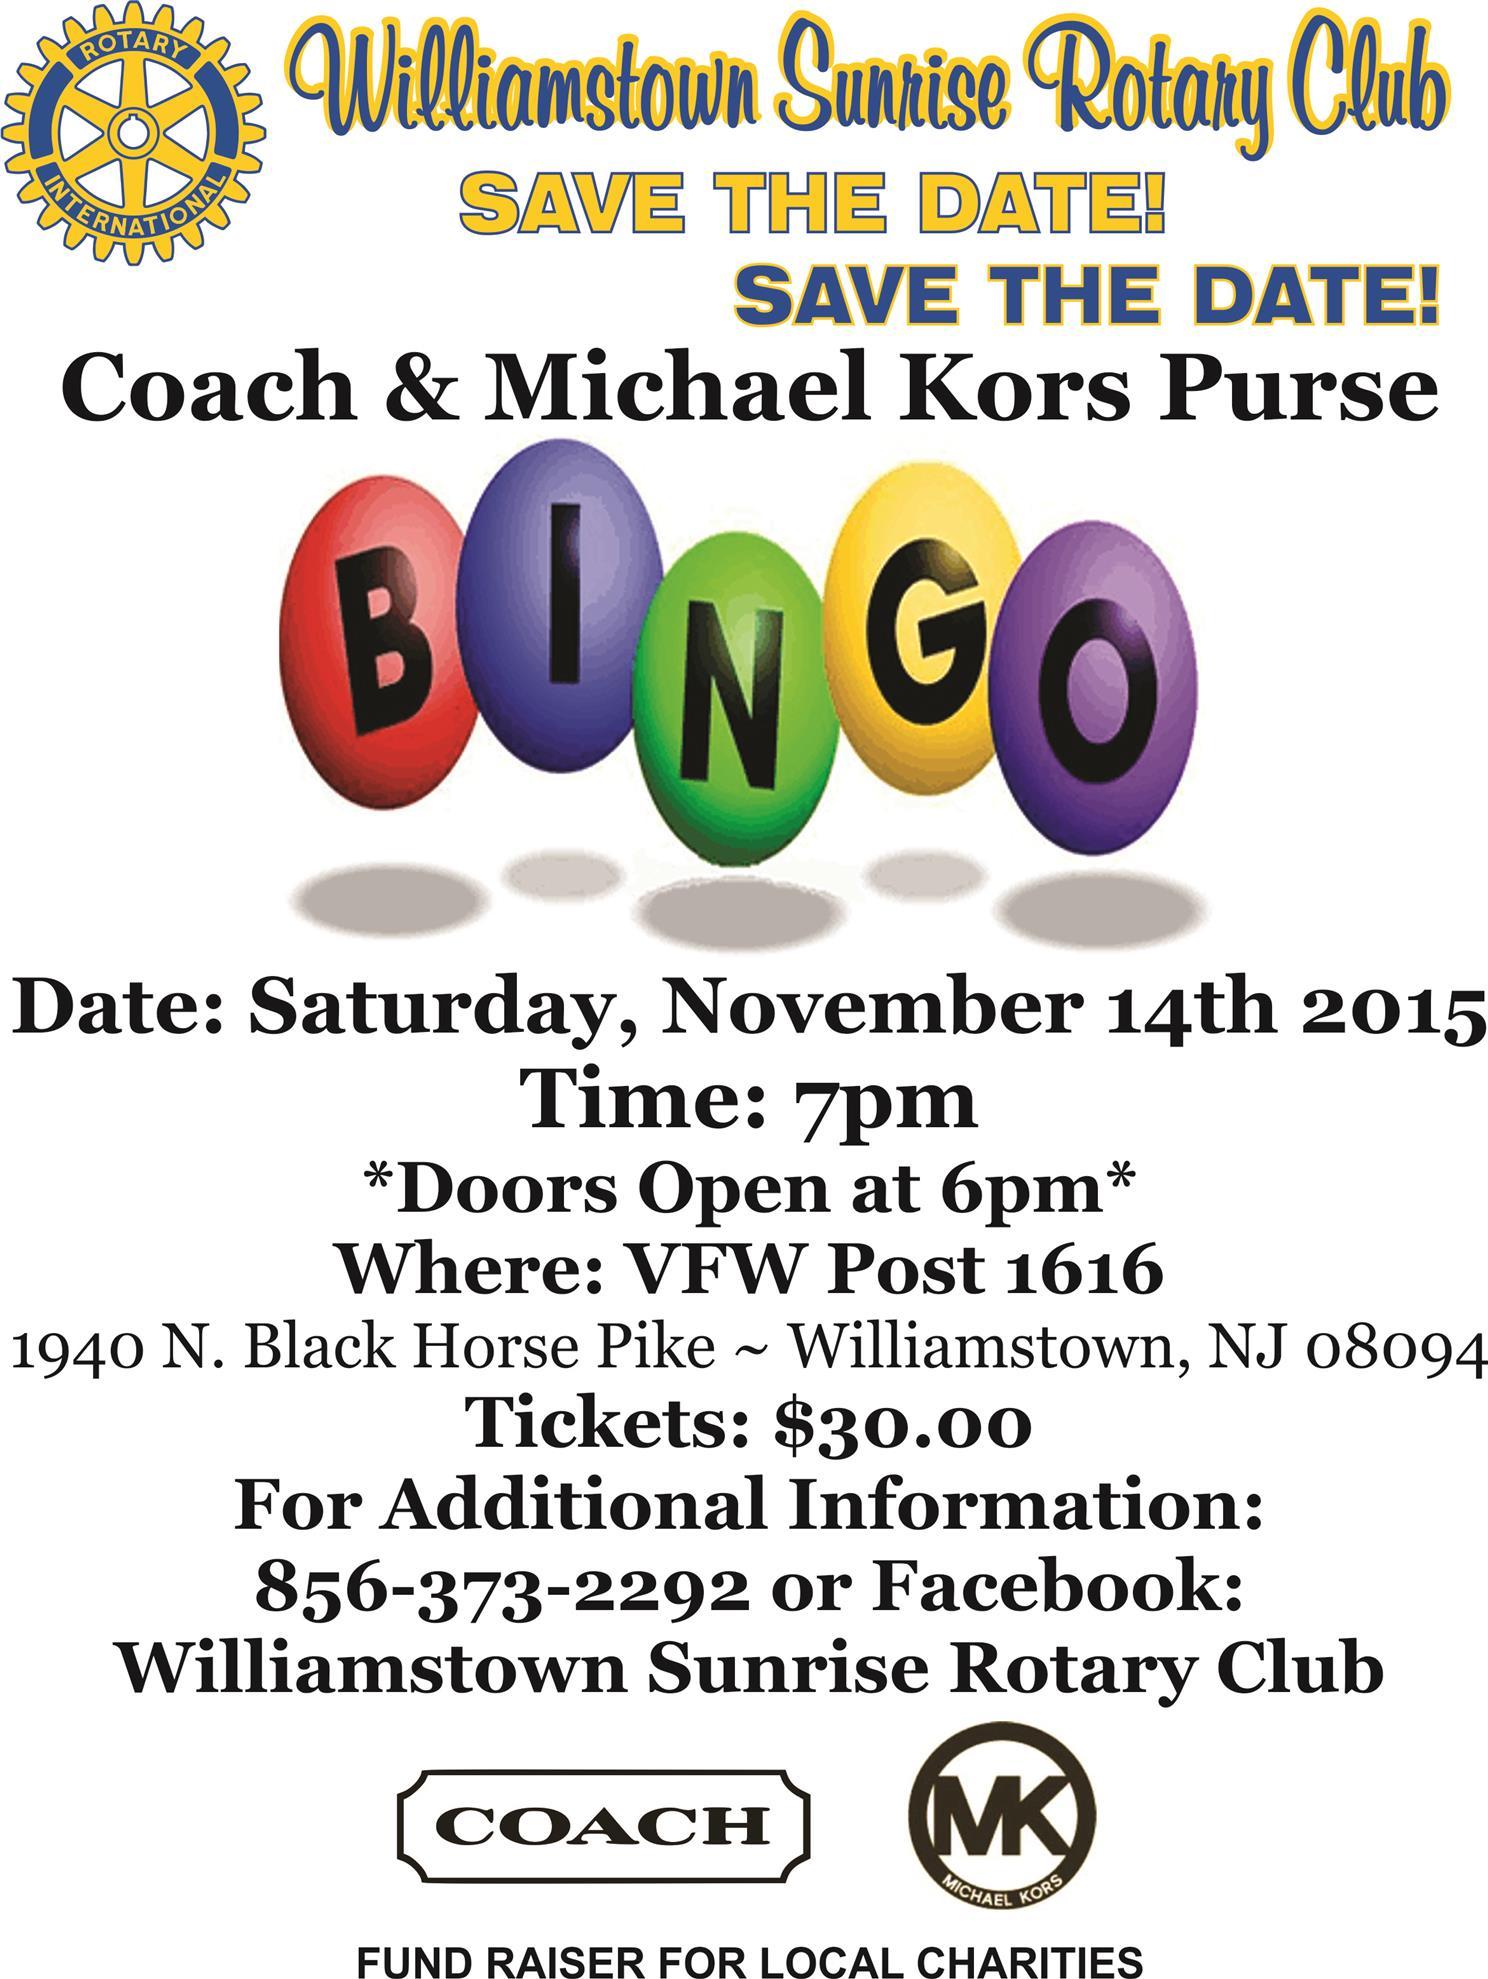 Coach & Michael Kors Bingo